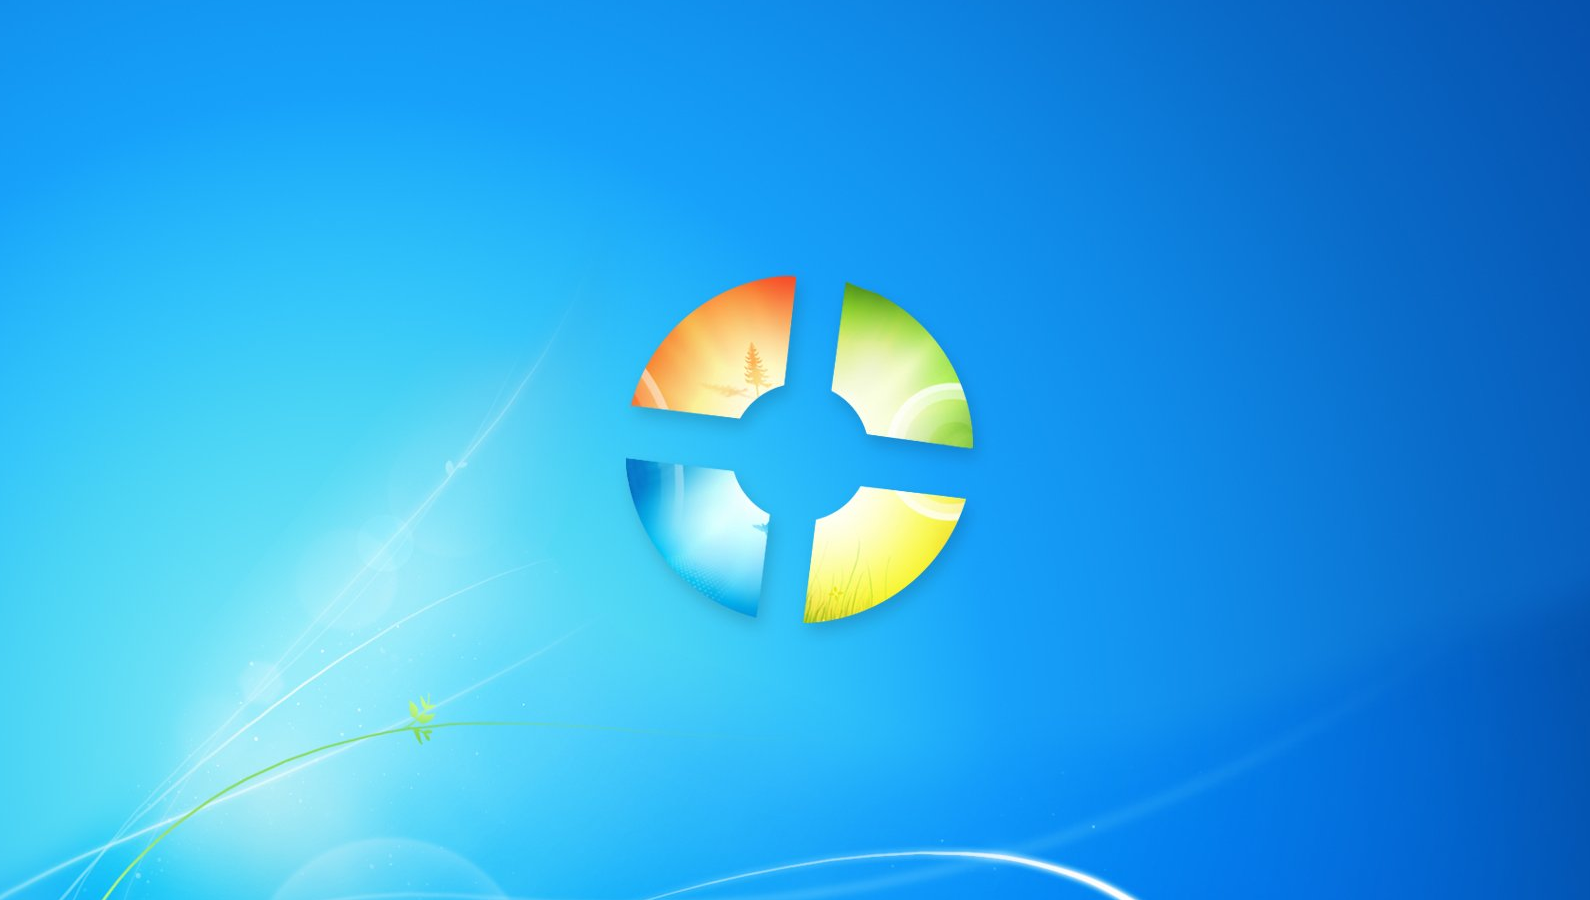 2 background images windows 7 - Windows 7 Wallpaper 1590x900 Windows 7 Wall Team Fortress 2